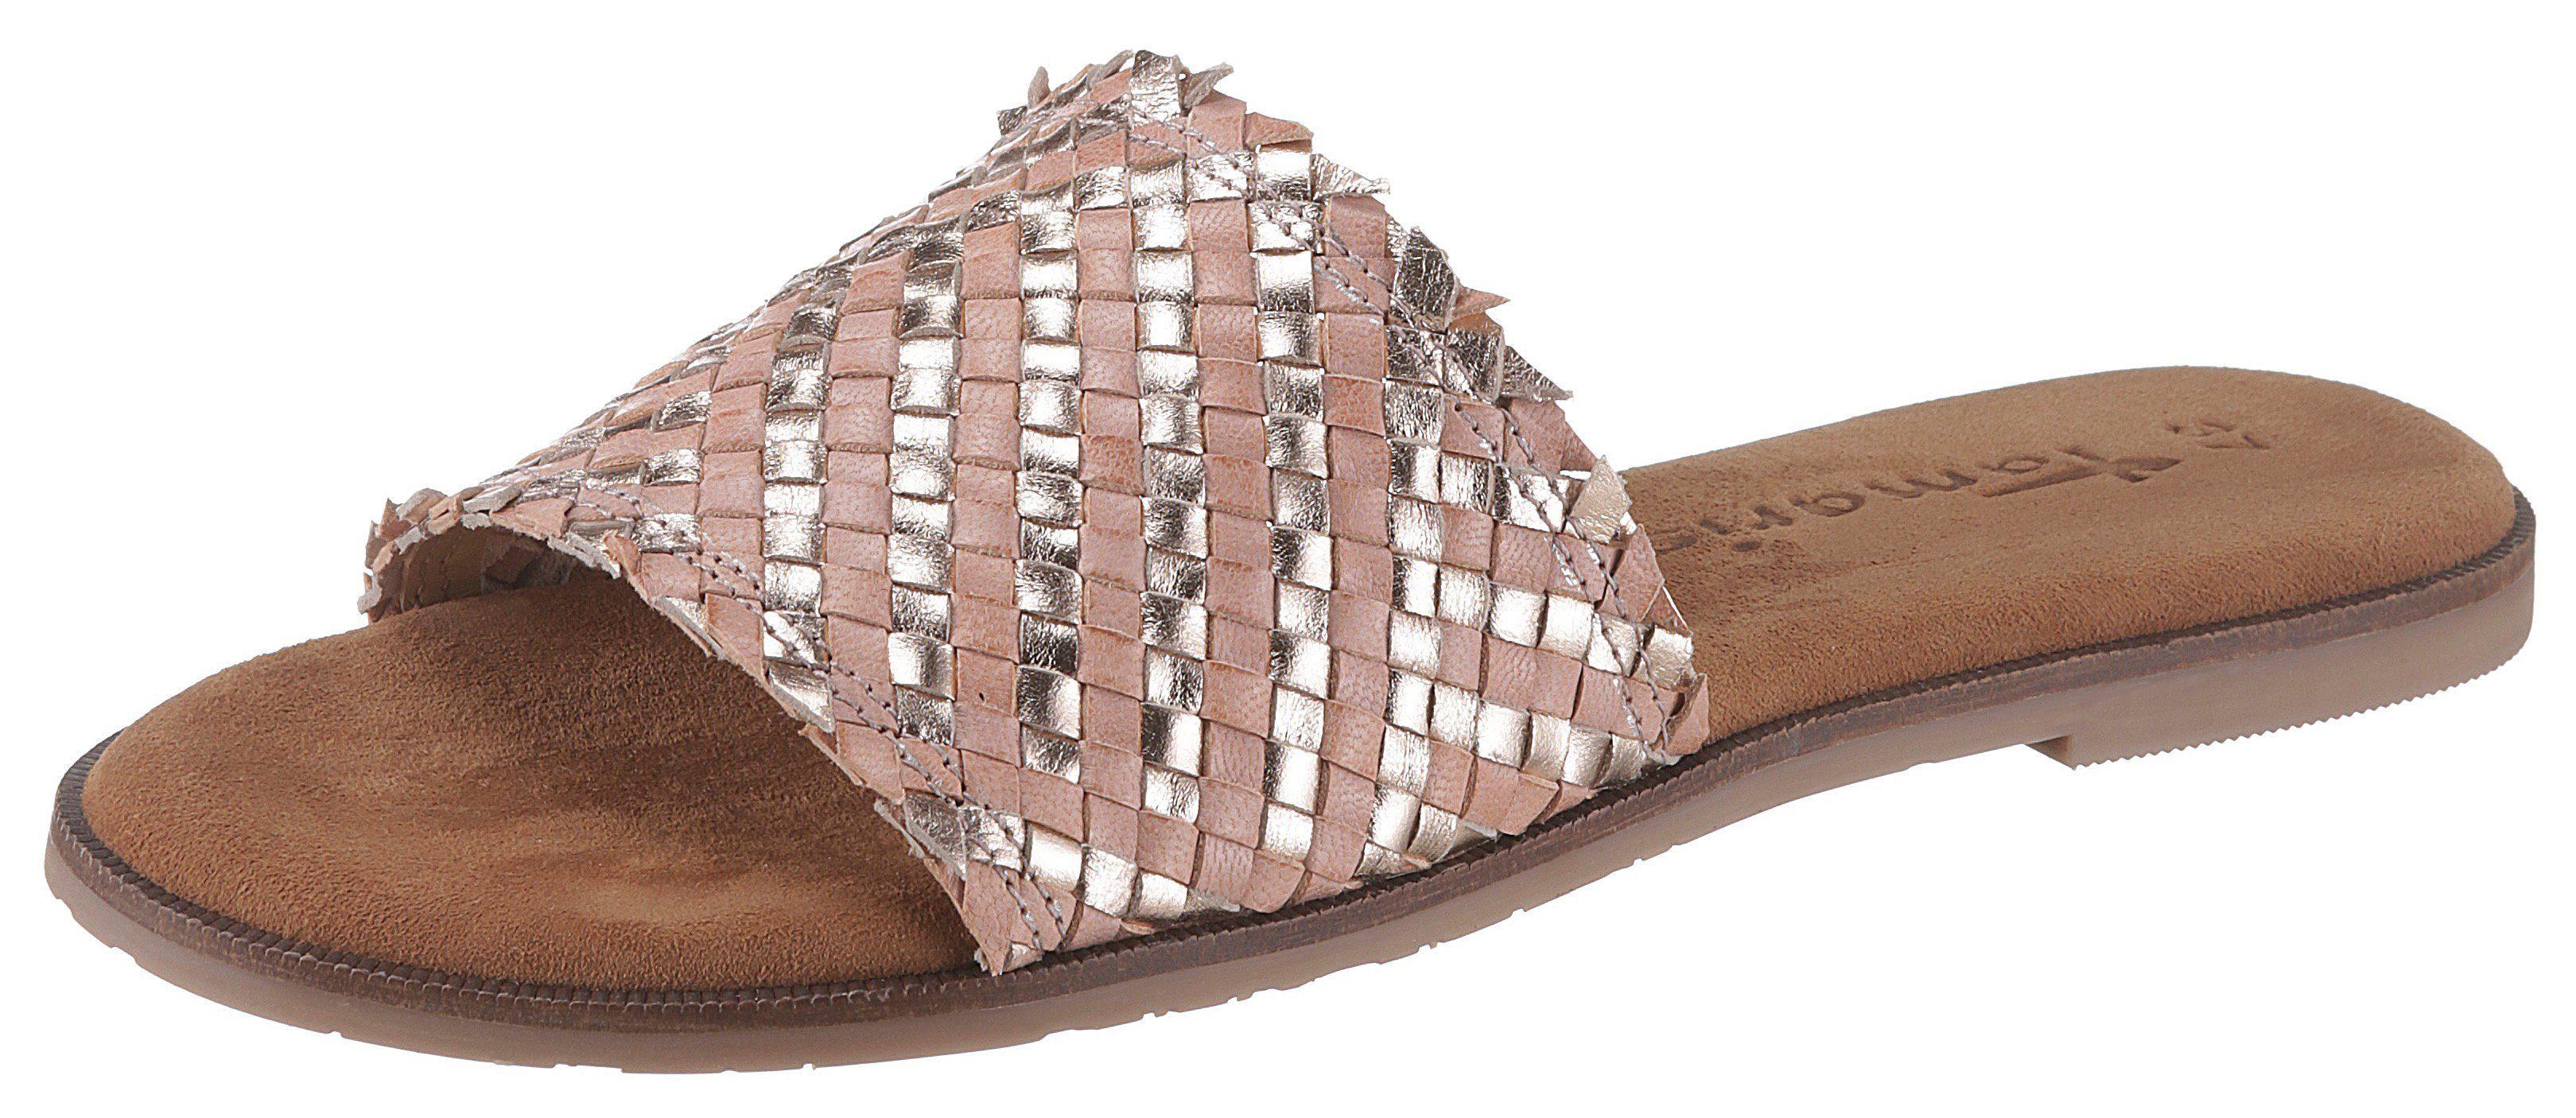 Tamaris »Crusy« Pantolette mit breiter Bandage | OTTO